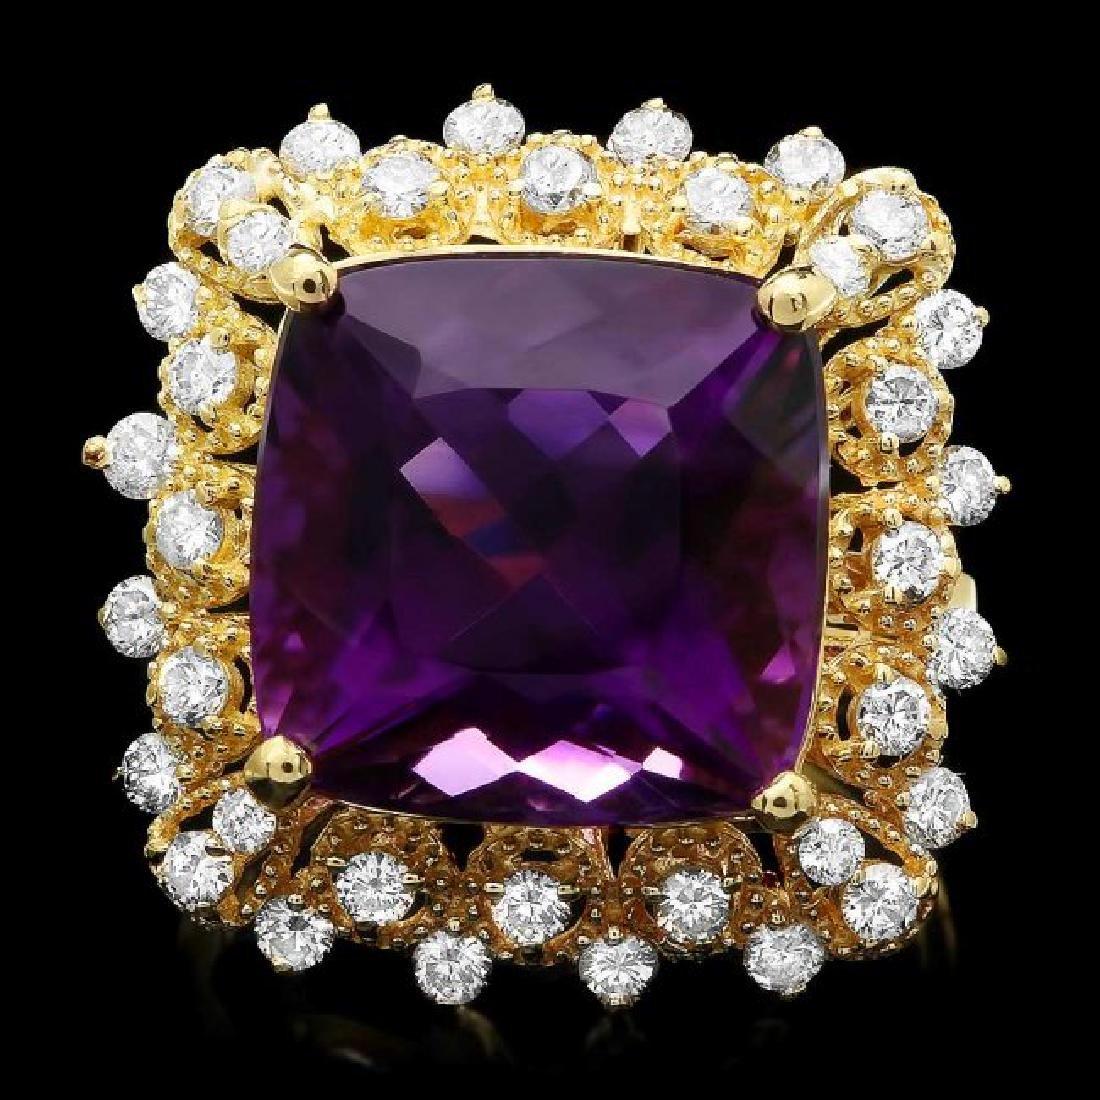 14k Gold 9.32ct Amethyst 0.90ct Diamond Ring